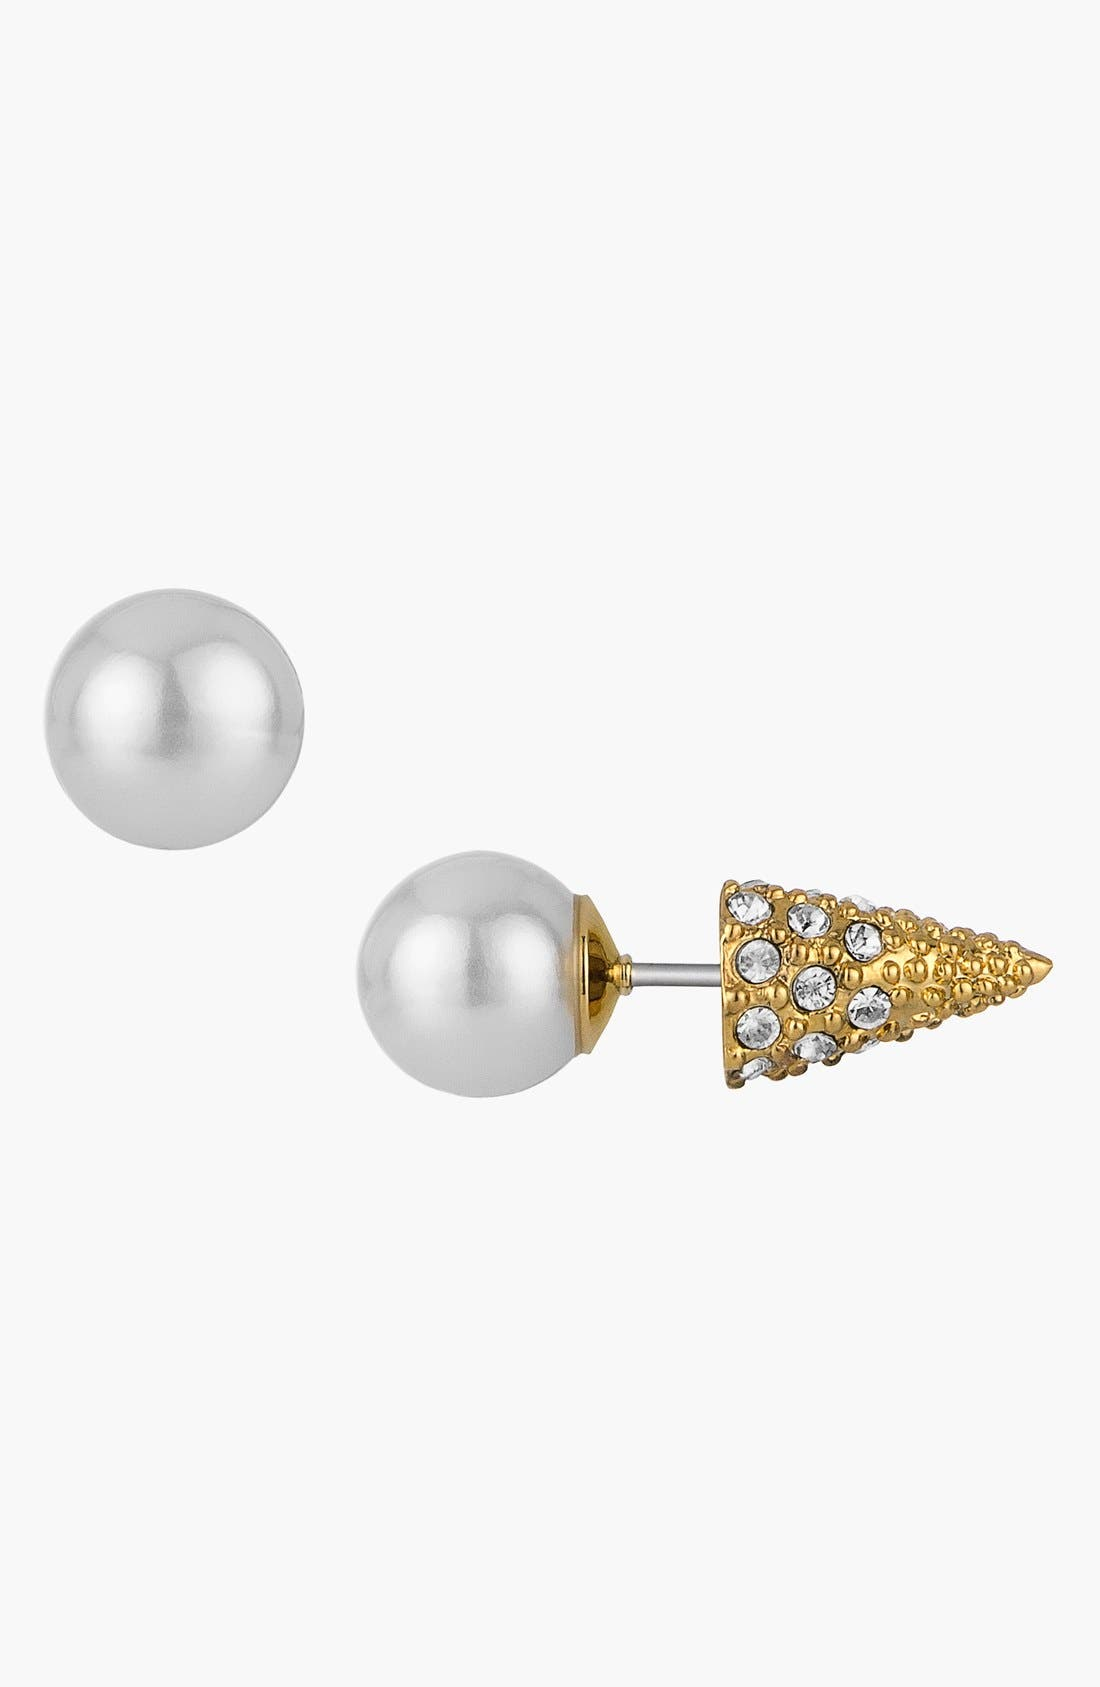 SAM EDELMAN, Reversible Faux Pearl & Spike Stud Earrings, Main thumbnail 1, color, 100